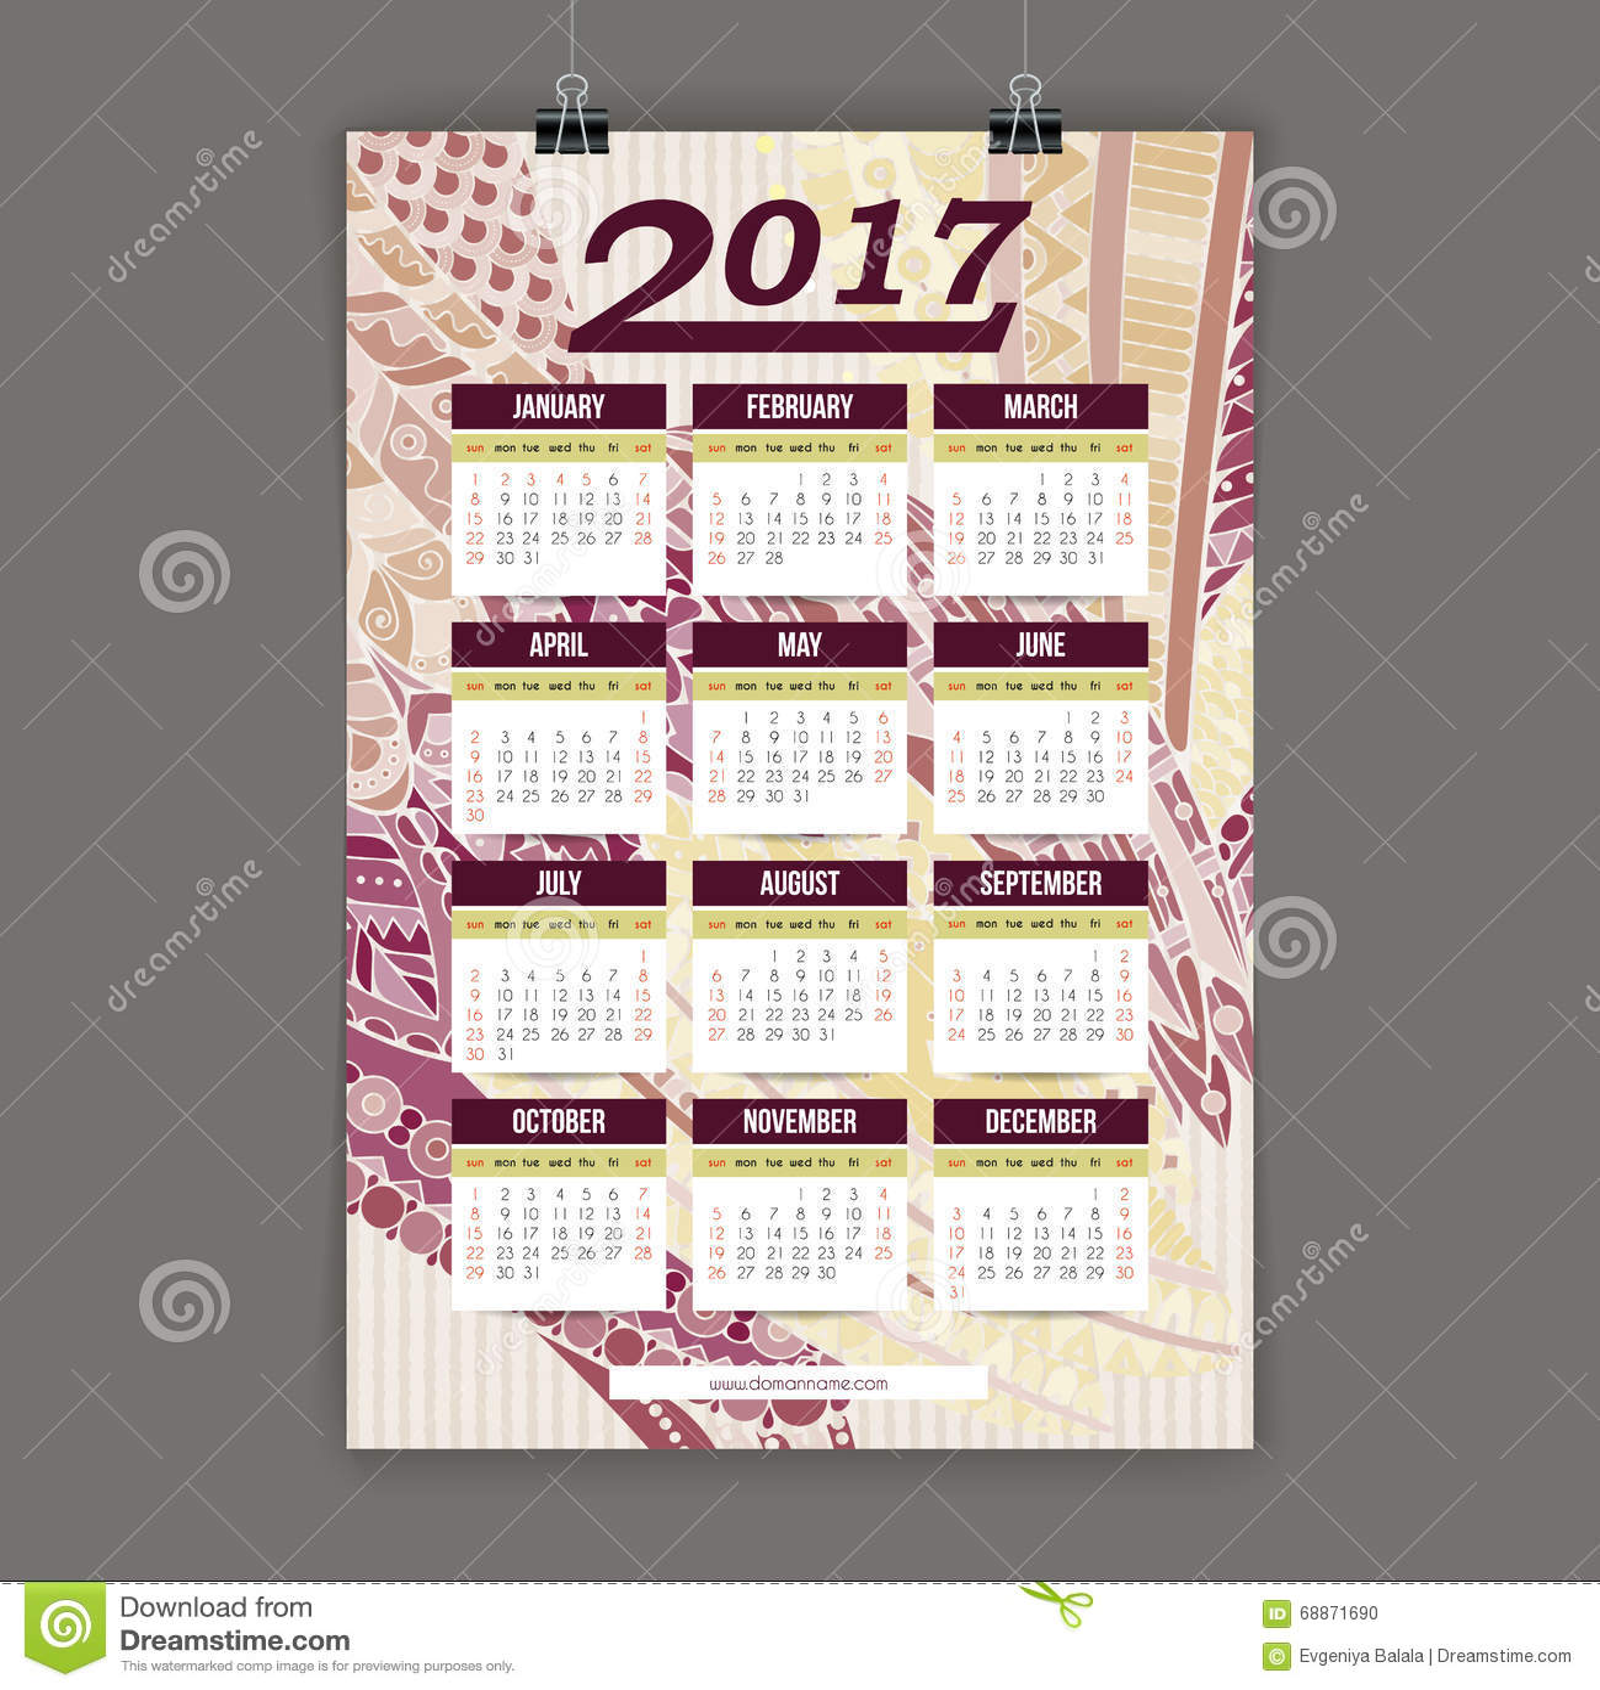 zentangle五颜六色的日历2017手画仿照花卉样式和图片